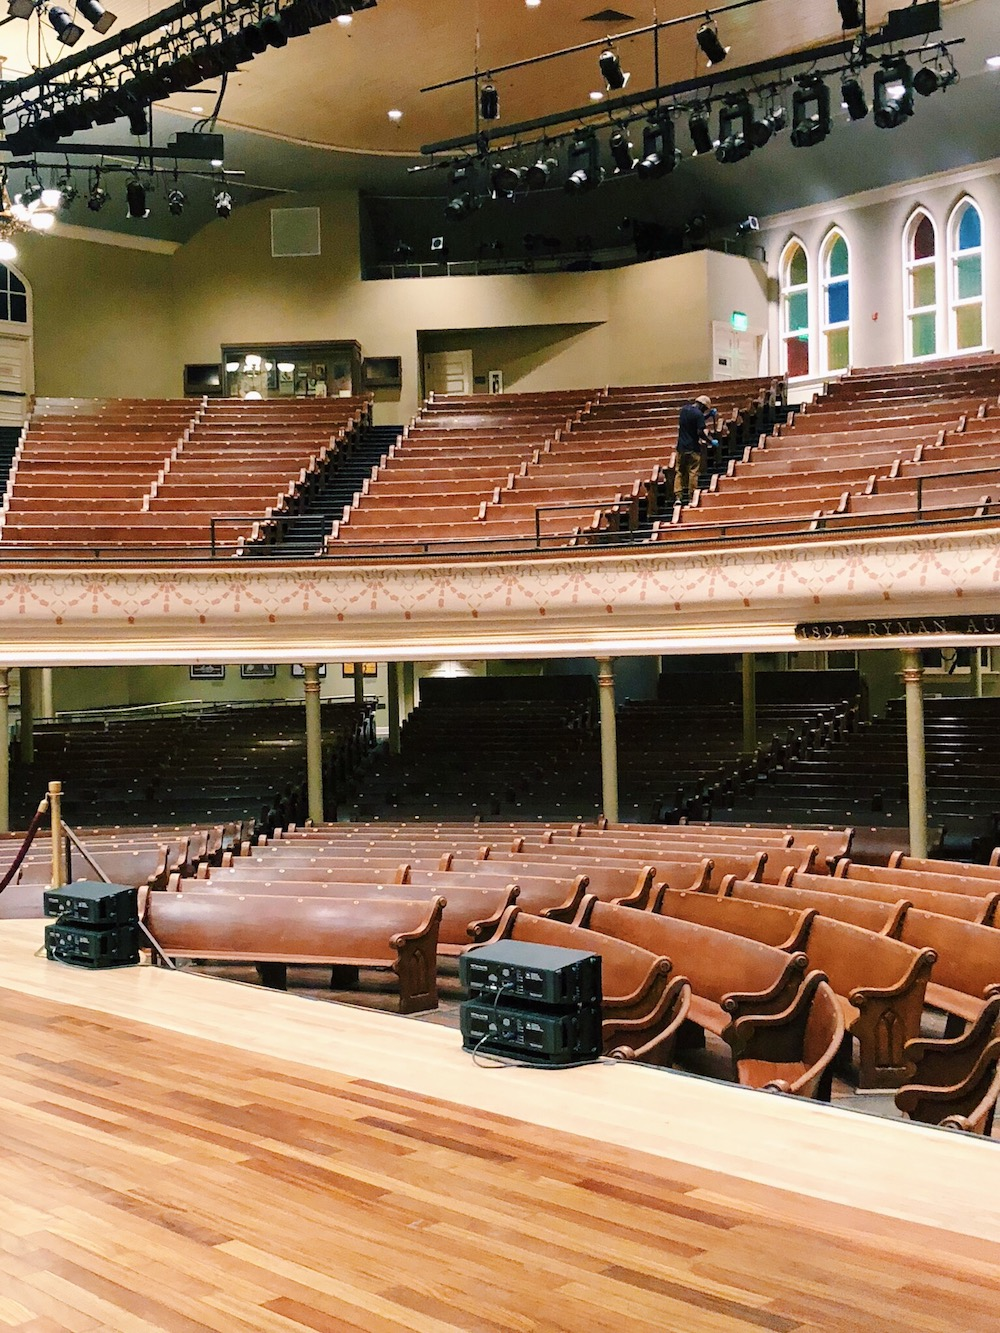 Church pews in Nashville music venue